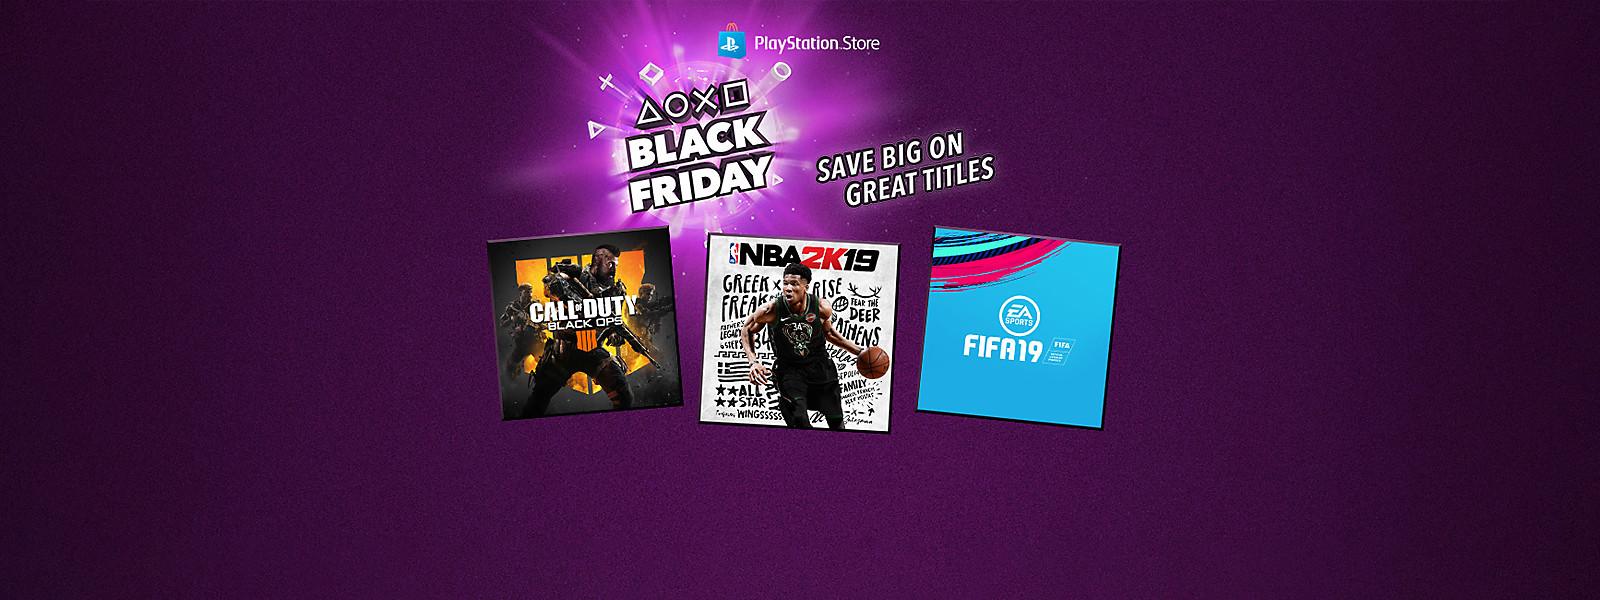 Black Friday Week Playstation